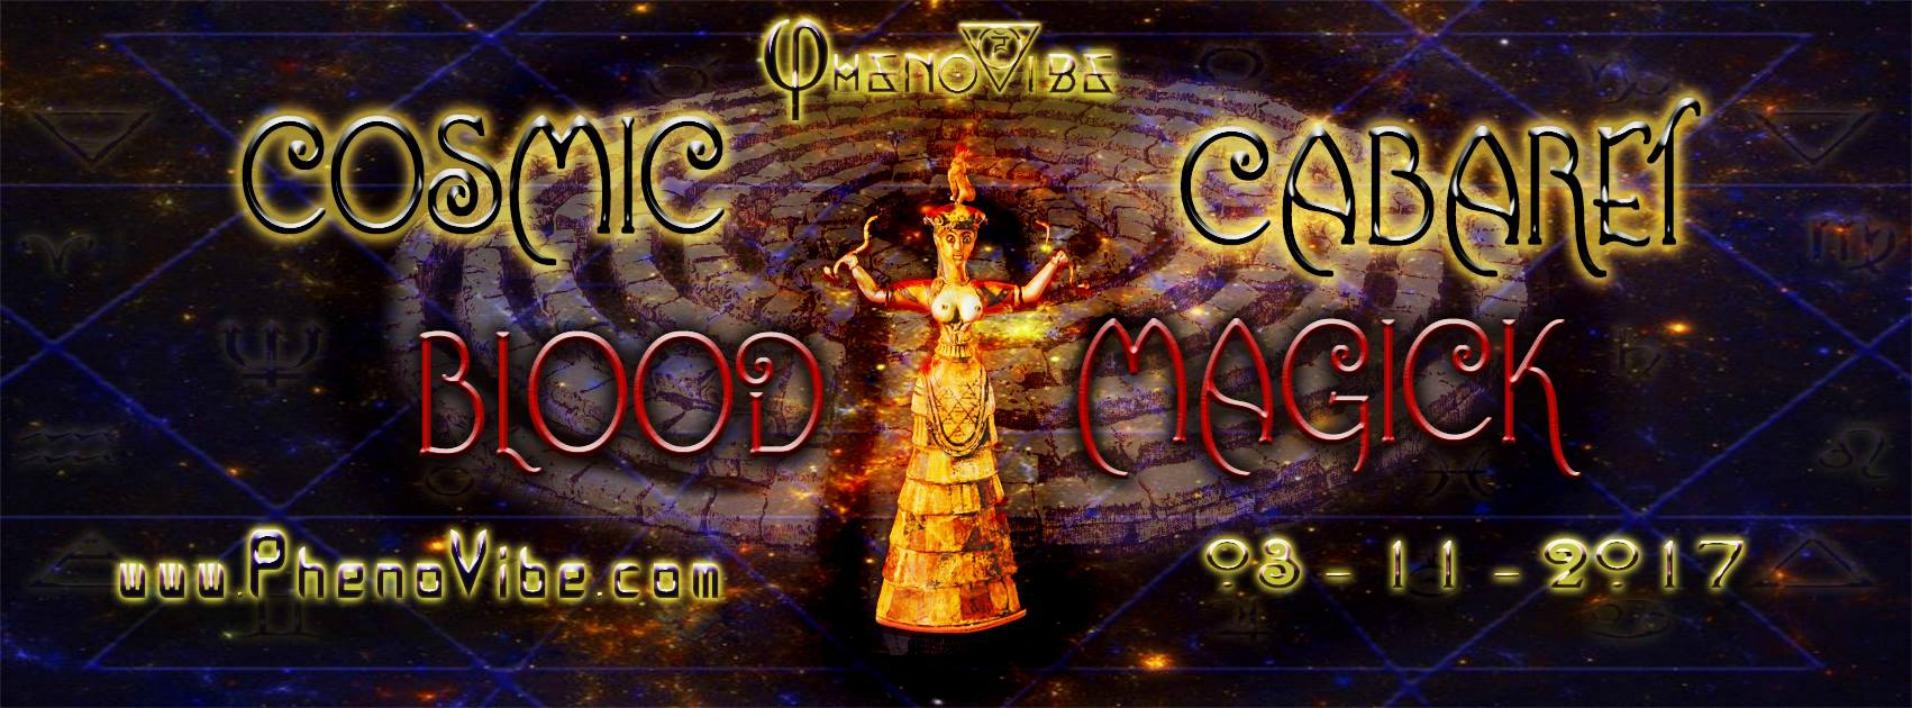 PhenoVibe Cosmic Cabaret Blood Magick